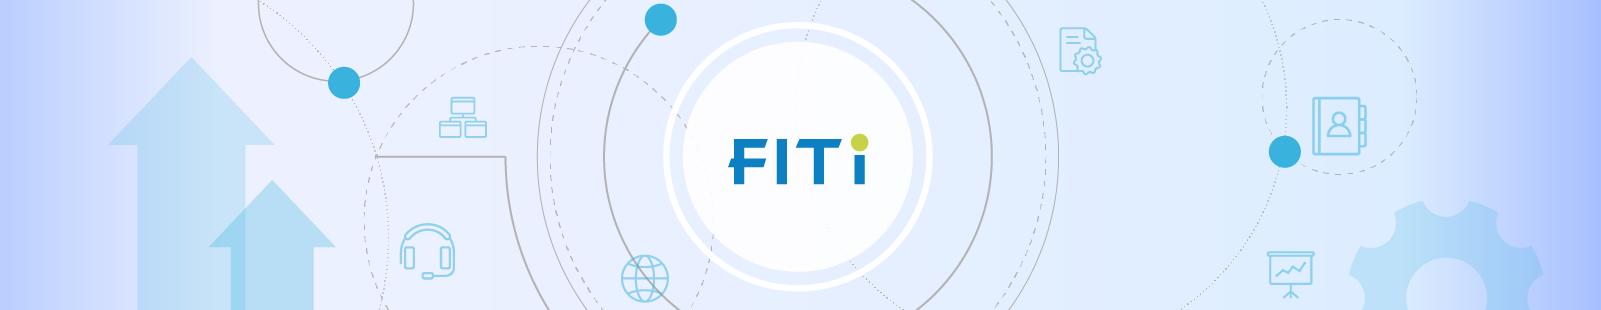 FITi Family